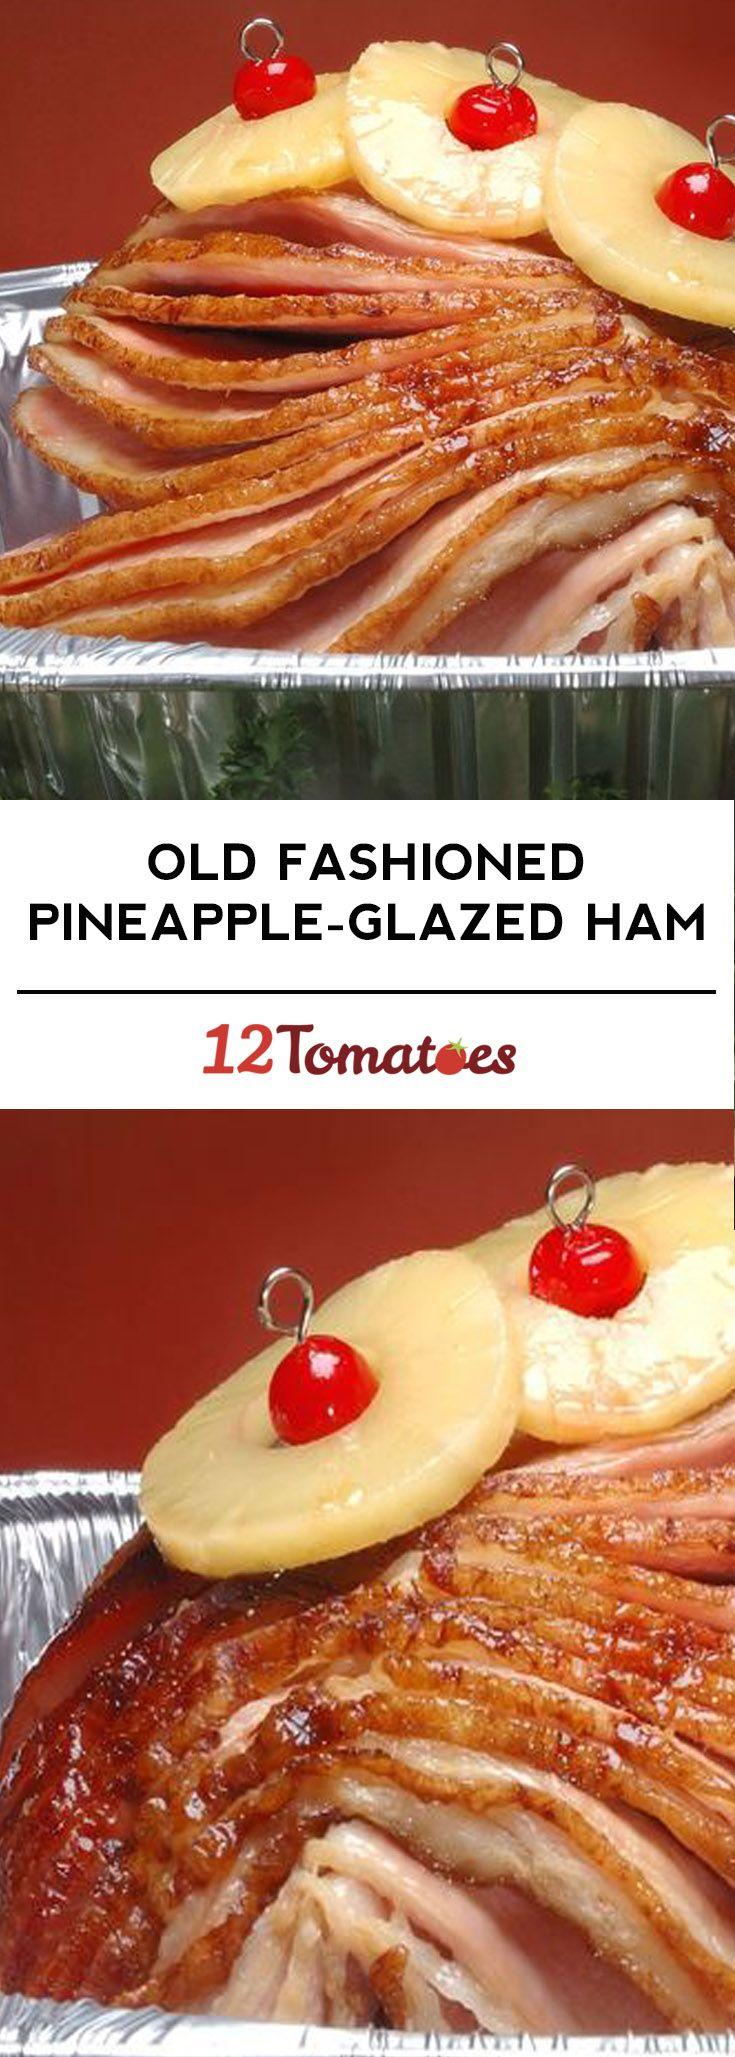 Old Fashioned Pineapple-Glazed Ham